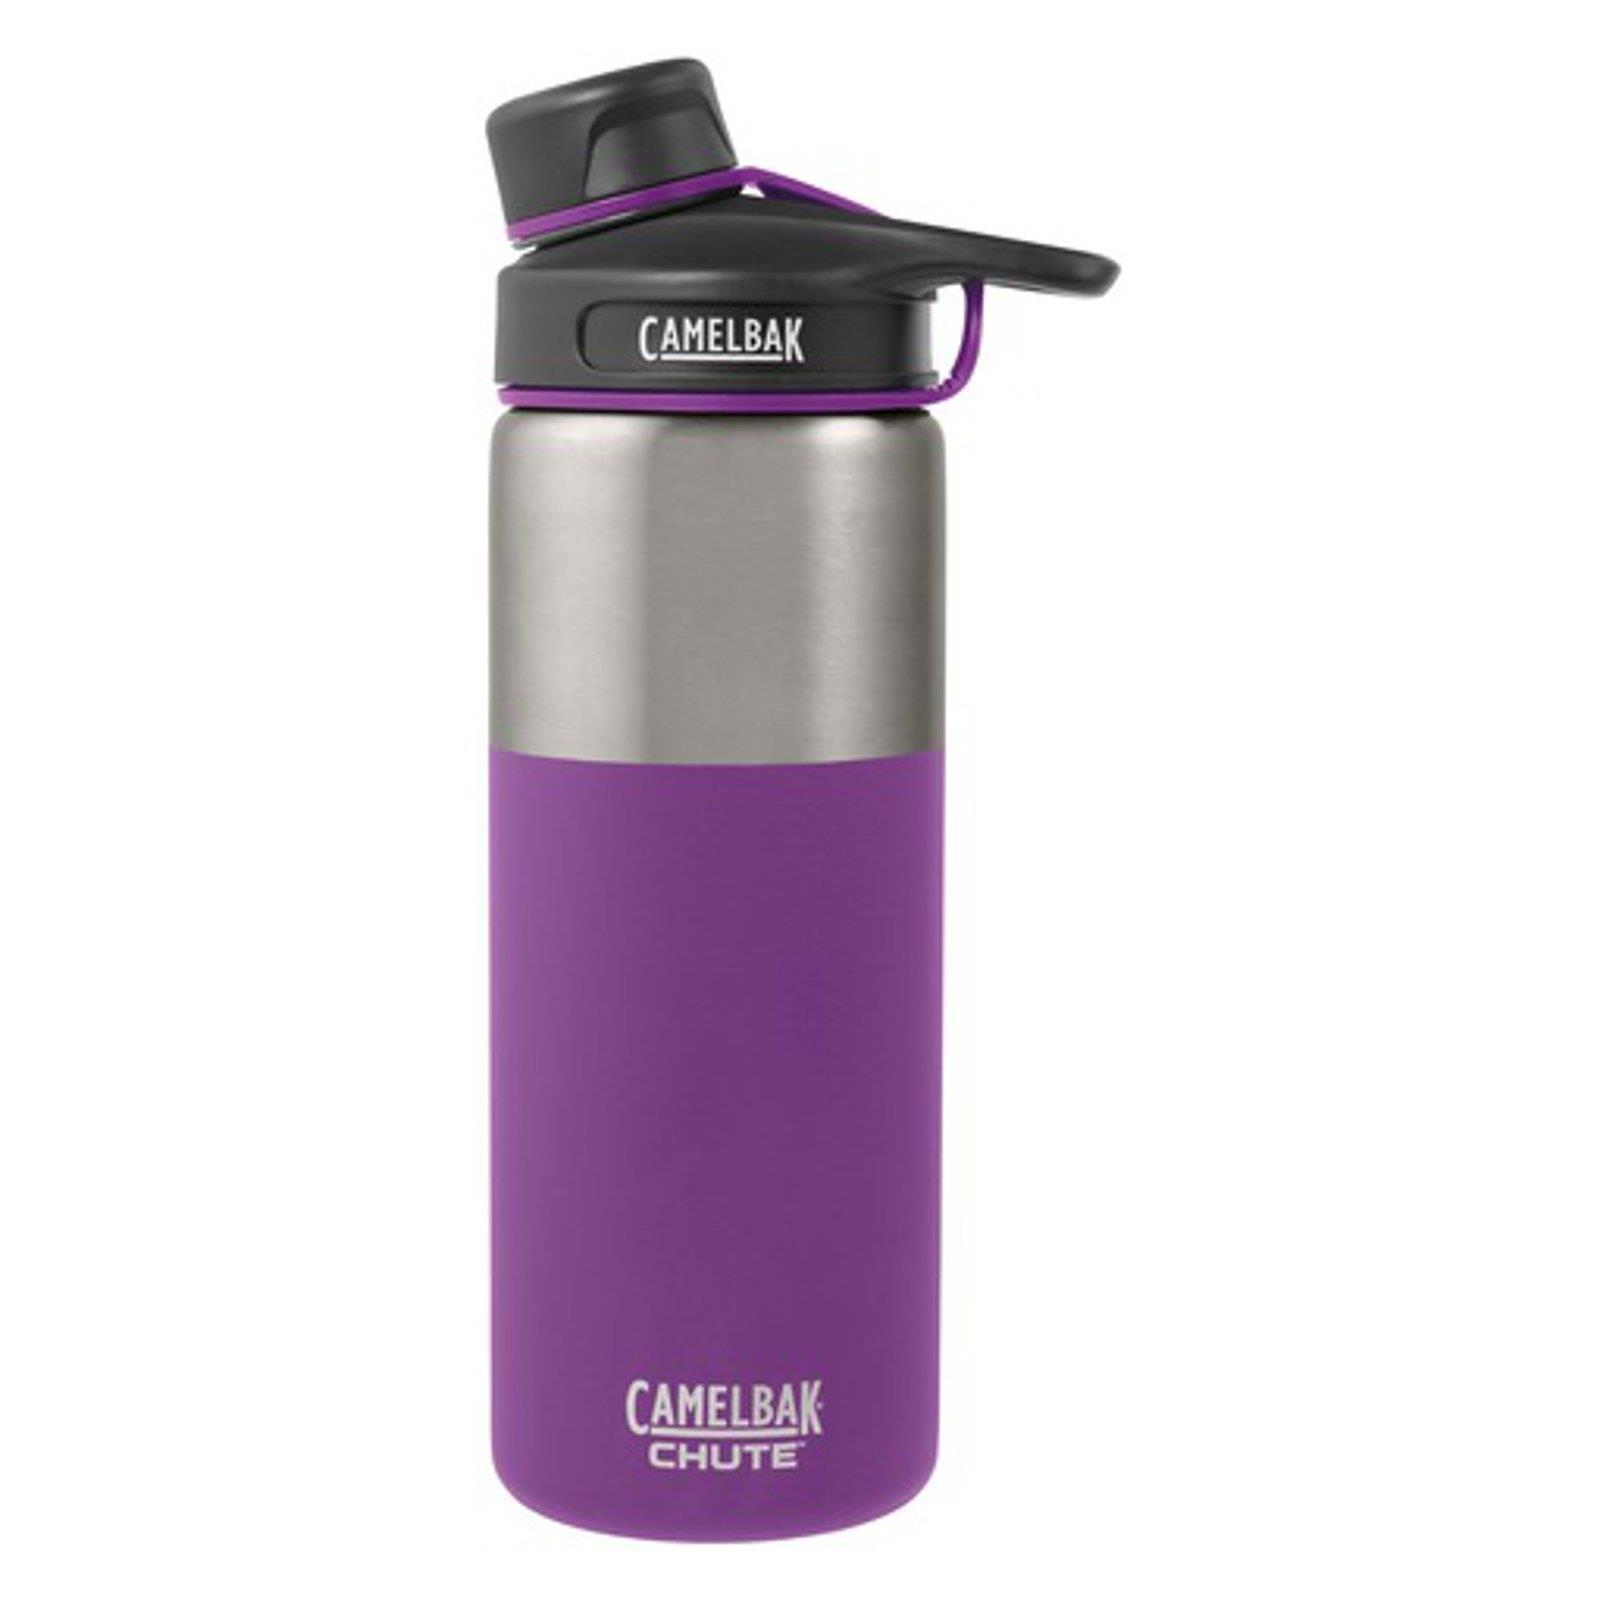 Camelbak-Trink-Isolier-Flasche-Chute-Vacuum-Thermo-Becher-Kanne-Outdoor Indexbild 18